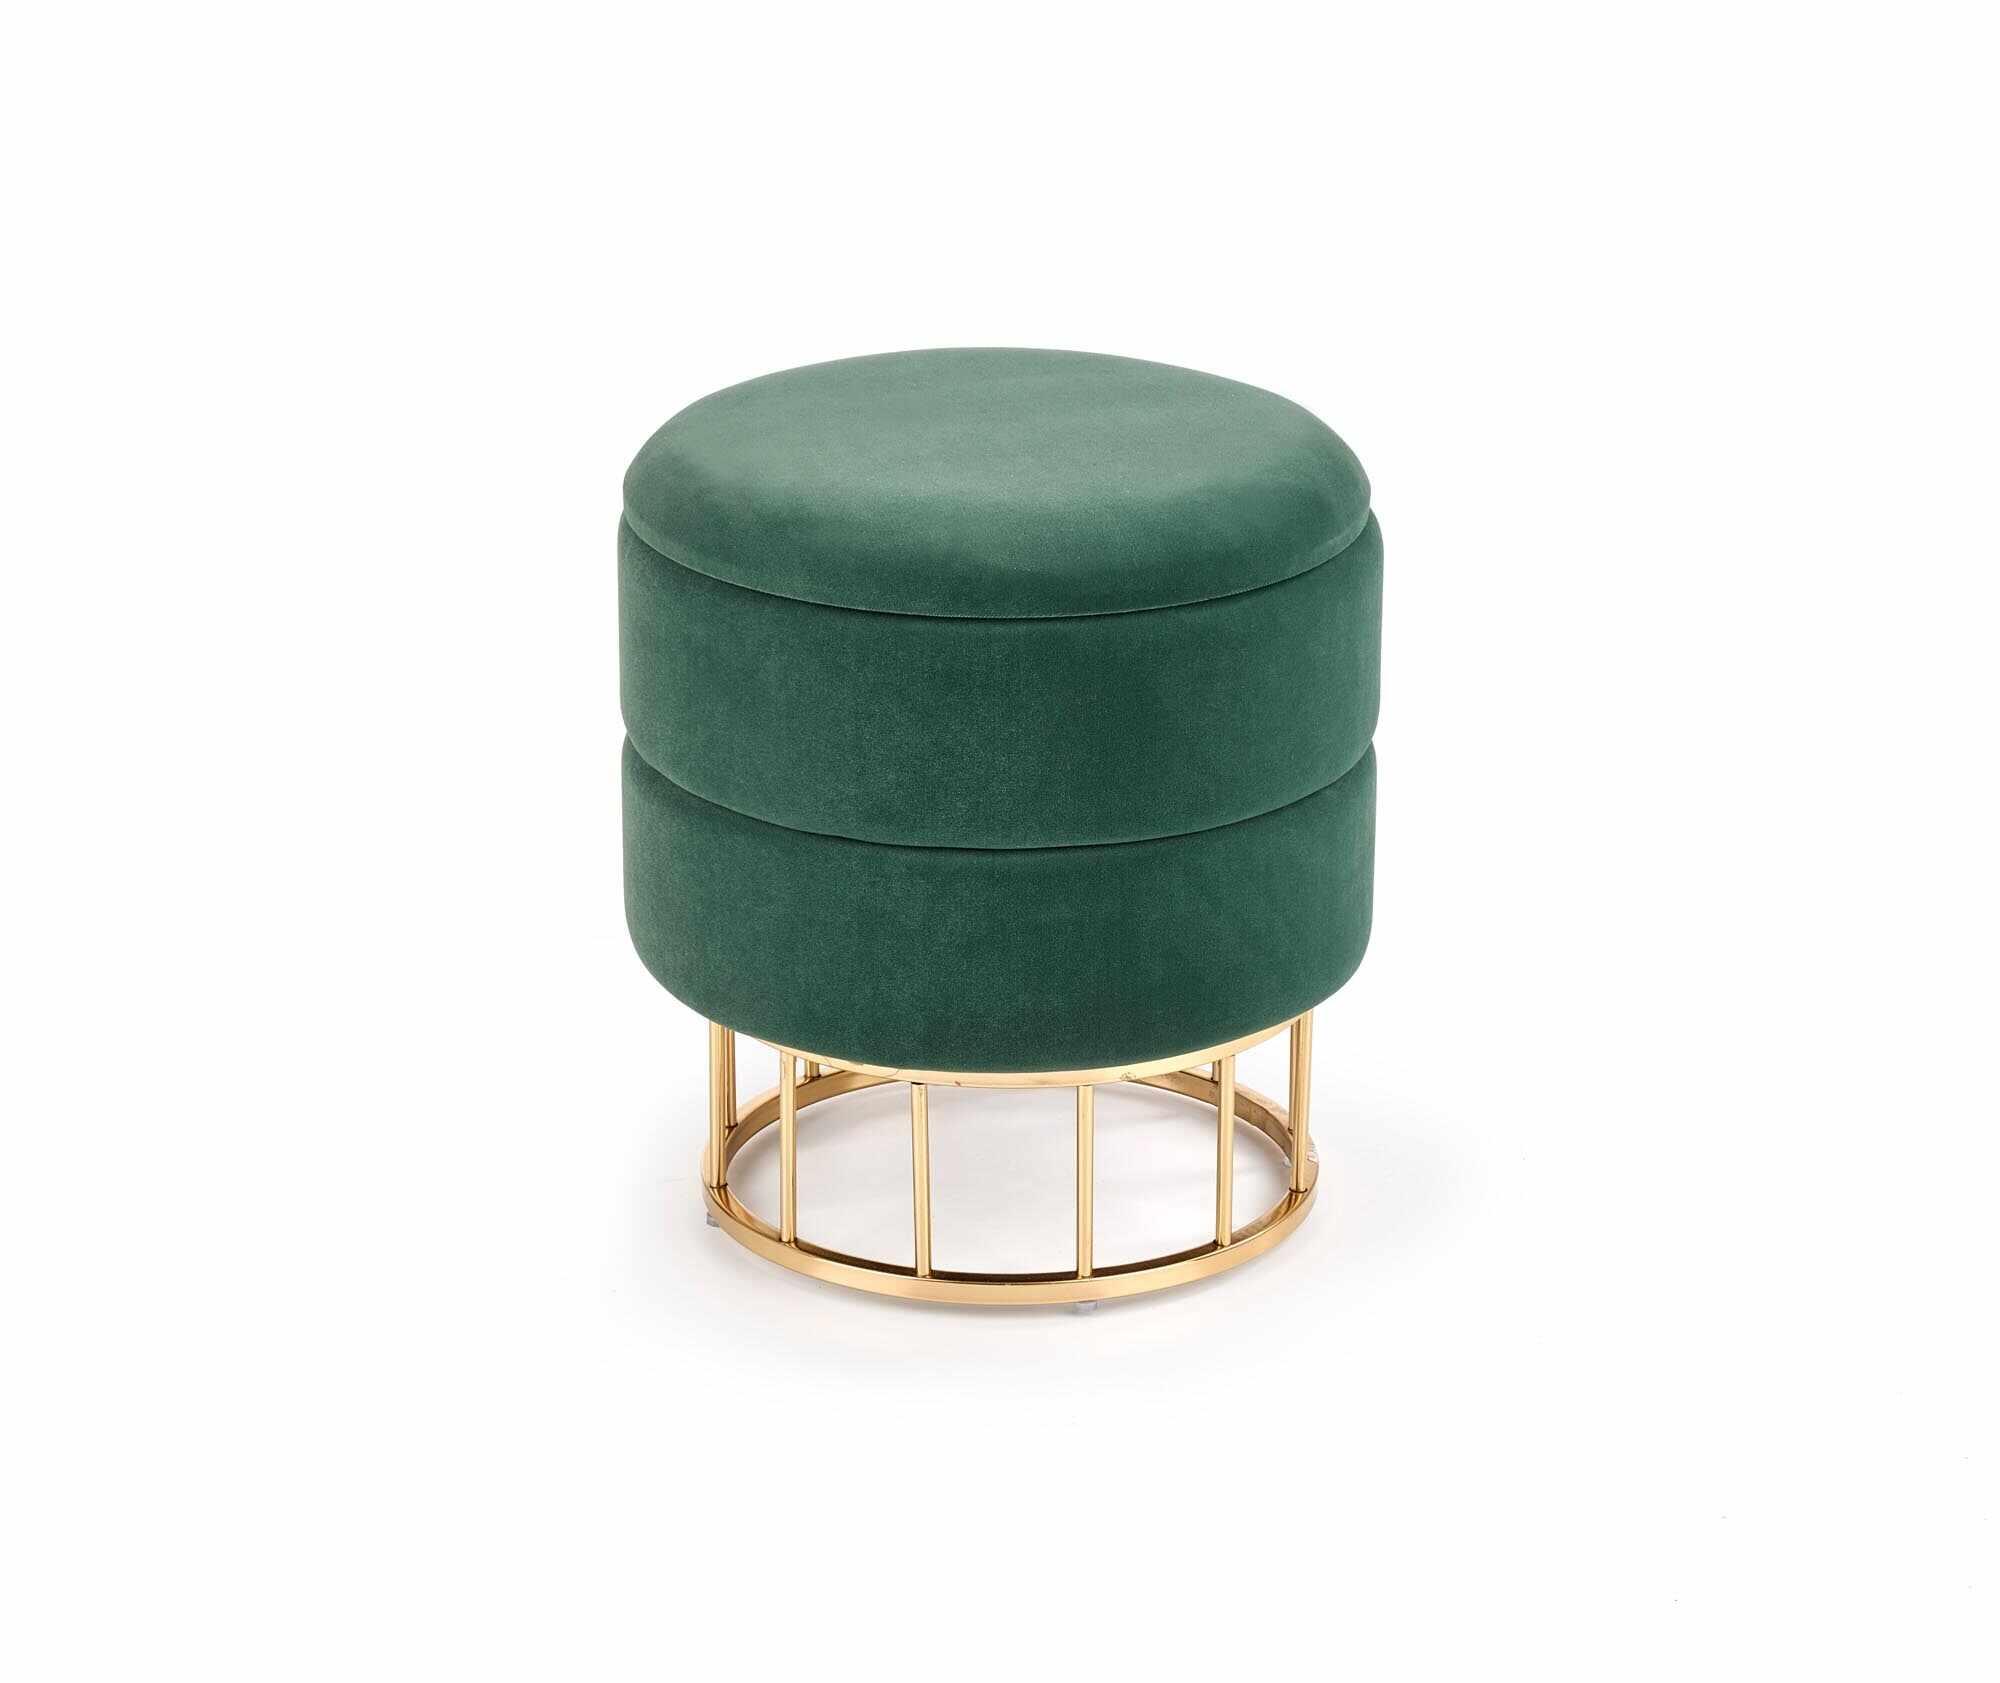 Taburet tapitat cu stofa si spatiu de depozitare Minty Verde inchis / Auriu, Ø37xH41 cm la pret 223 lei